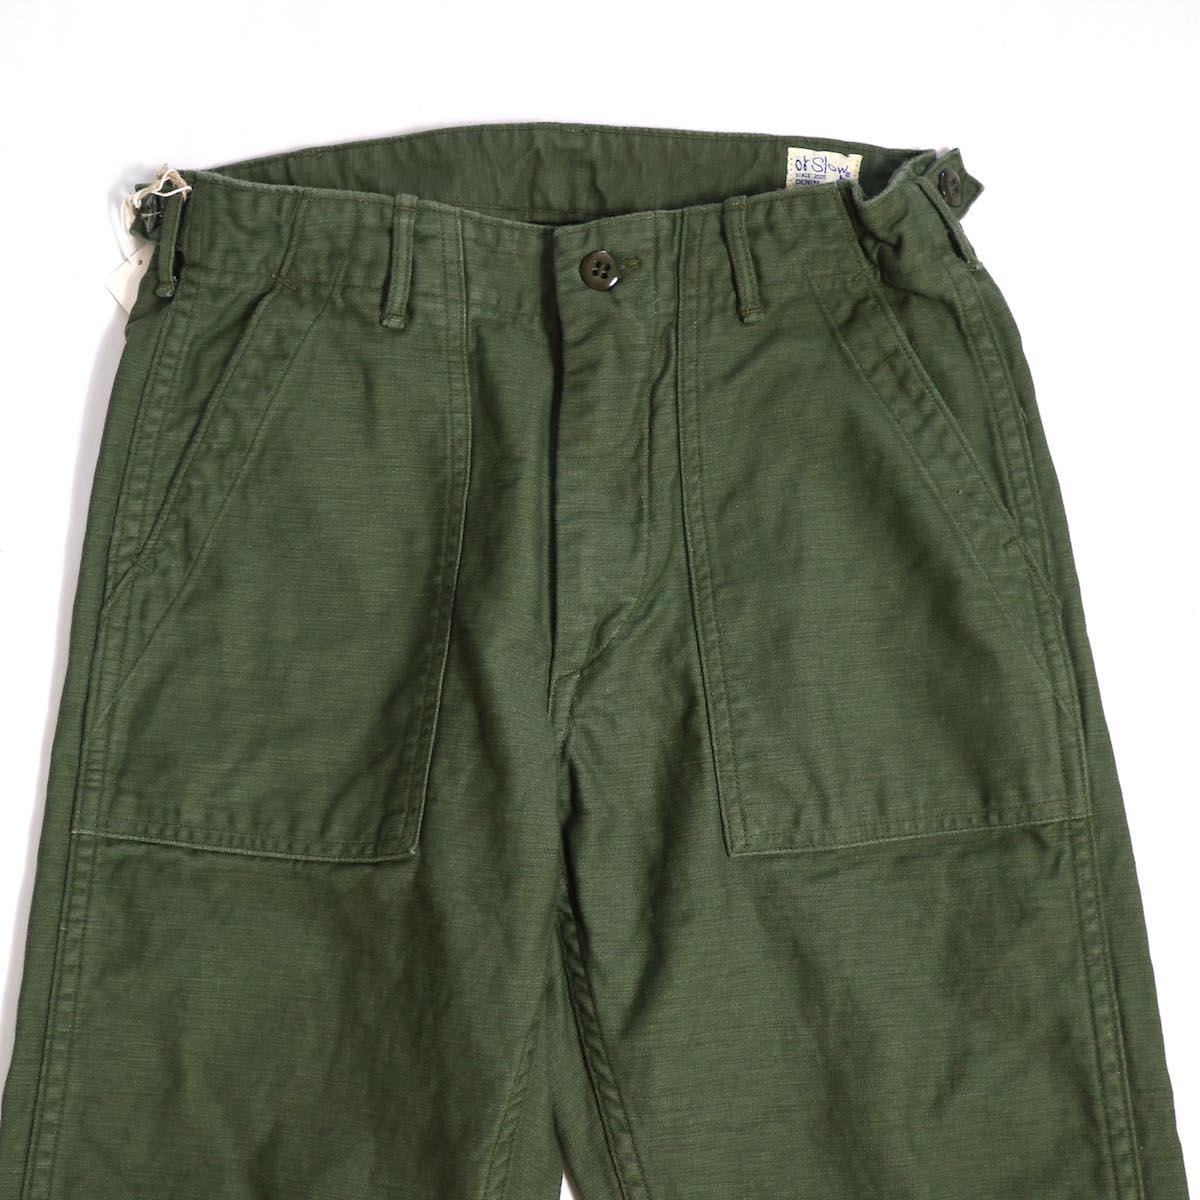 orSlow / SLIM FIT FATIGUE PANTS ウエスト